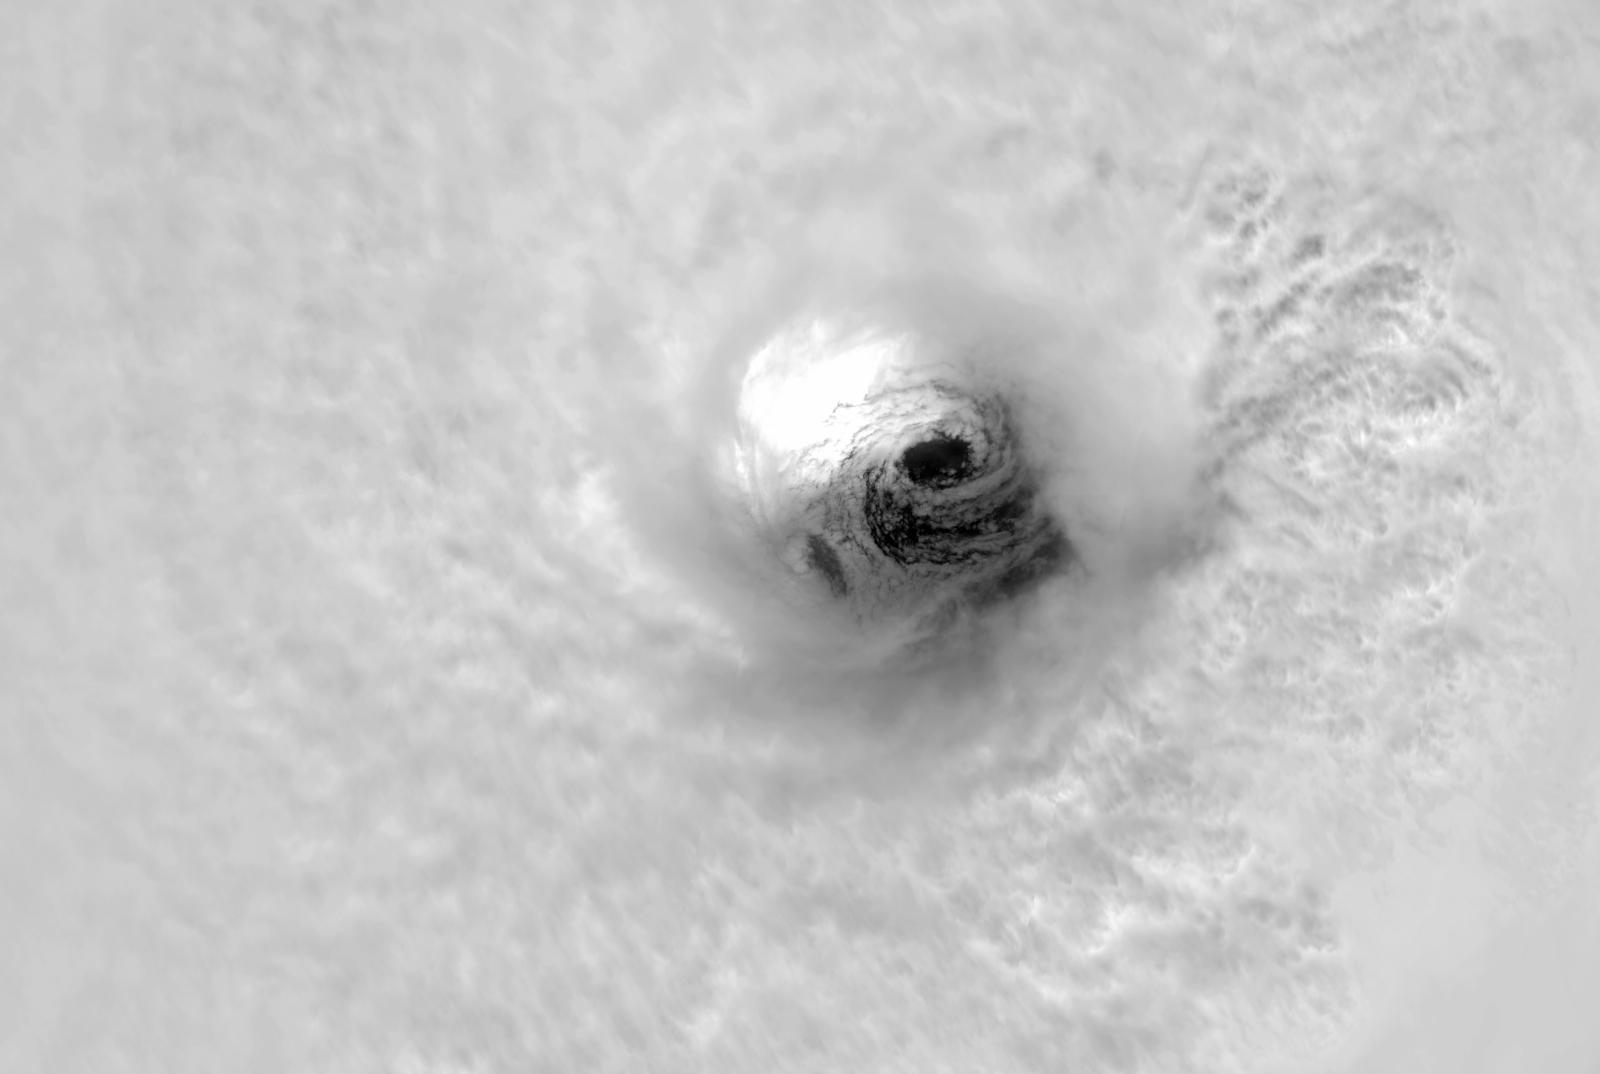 World Missionary Press sends hope to hurricane survivors